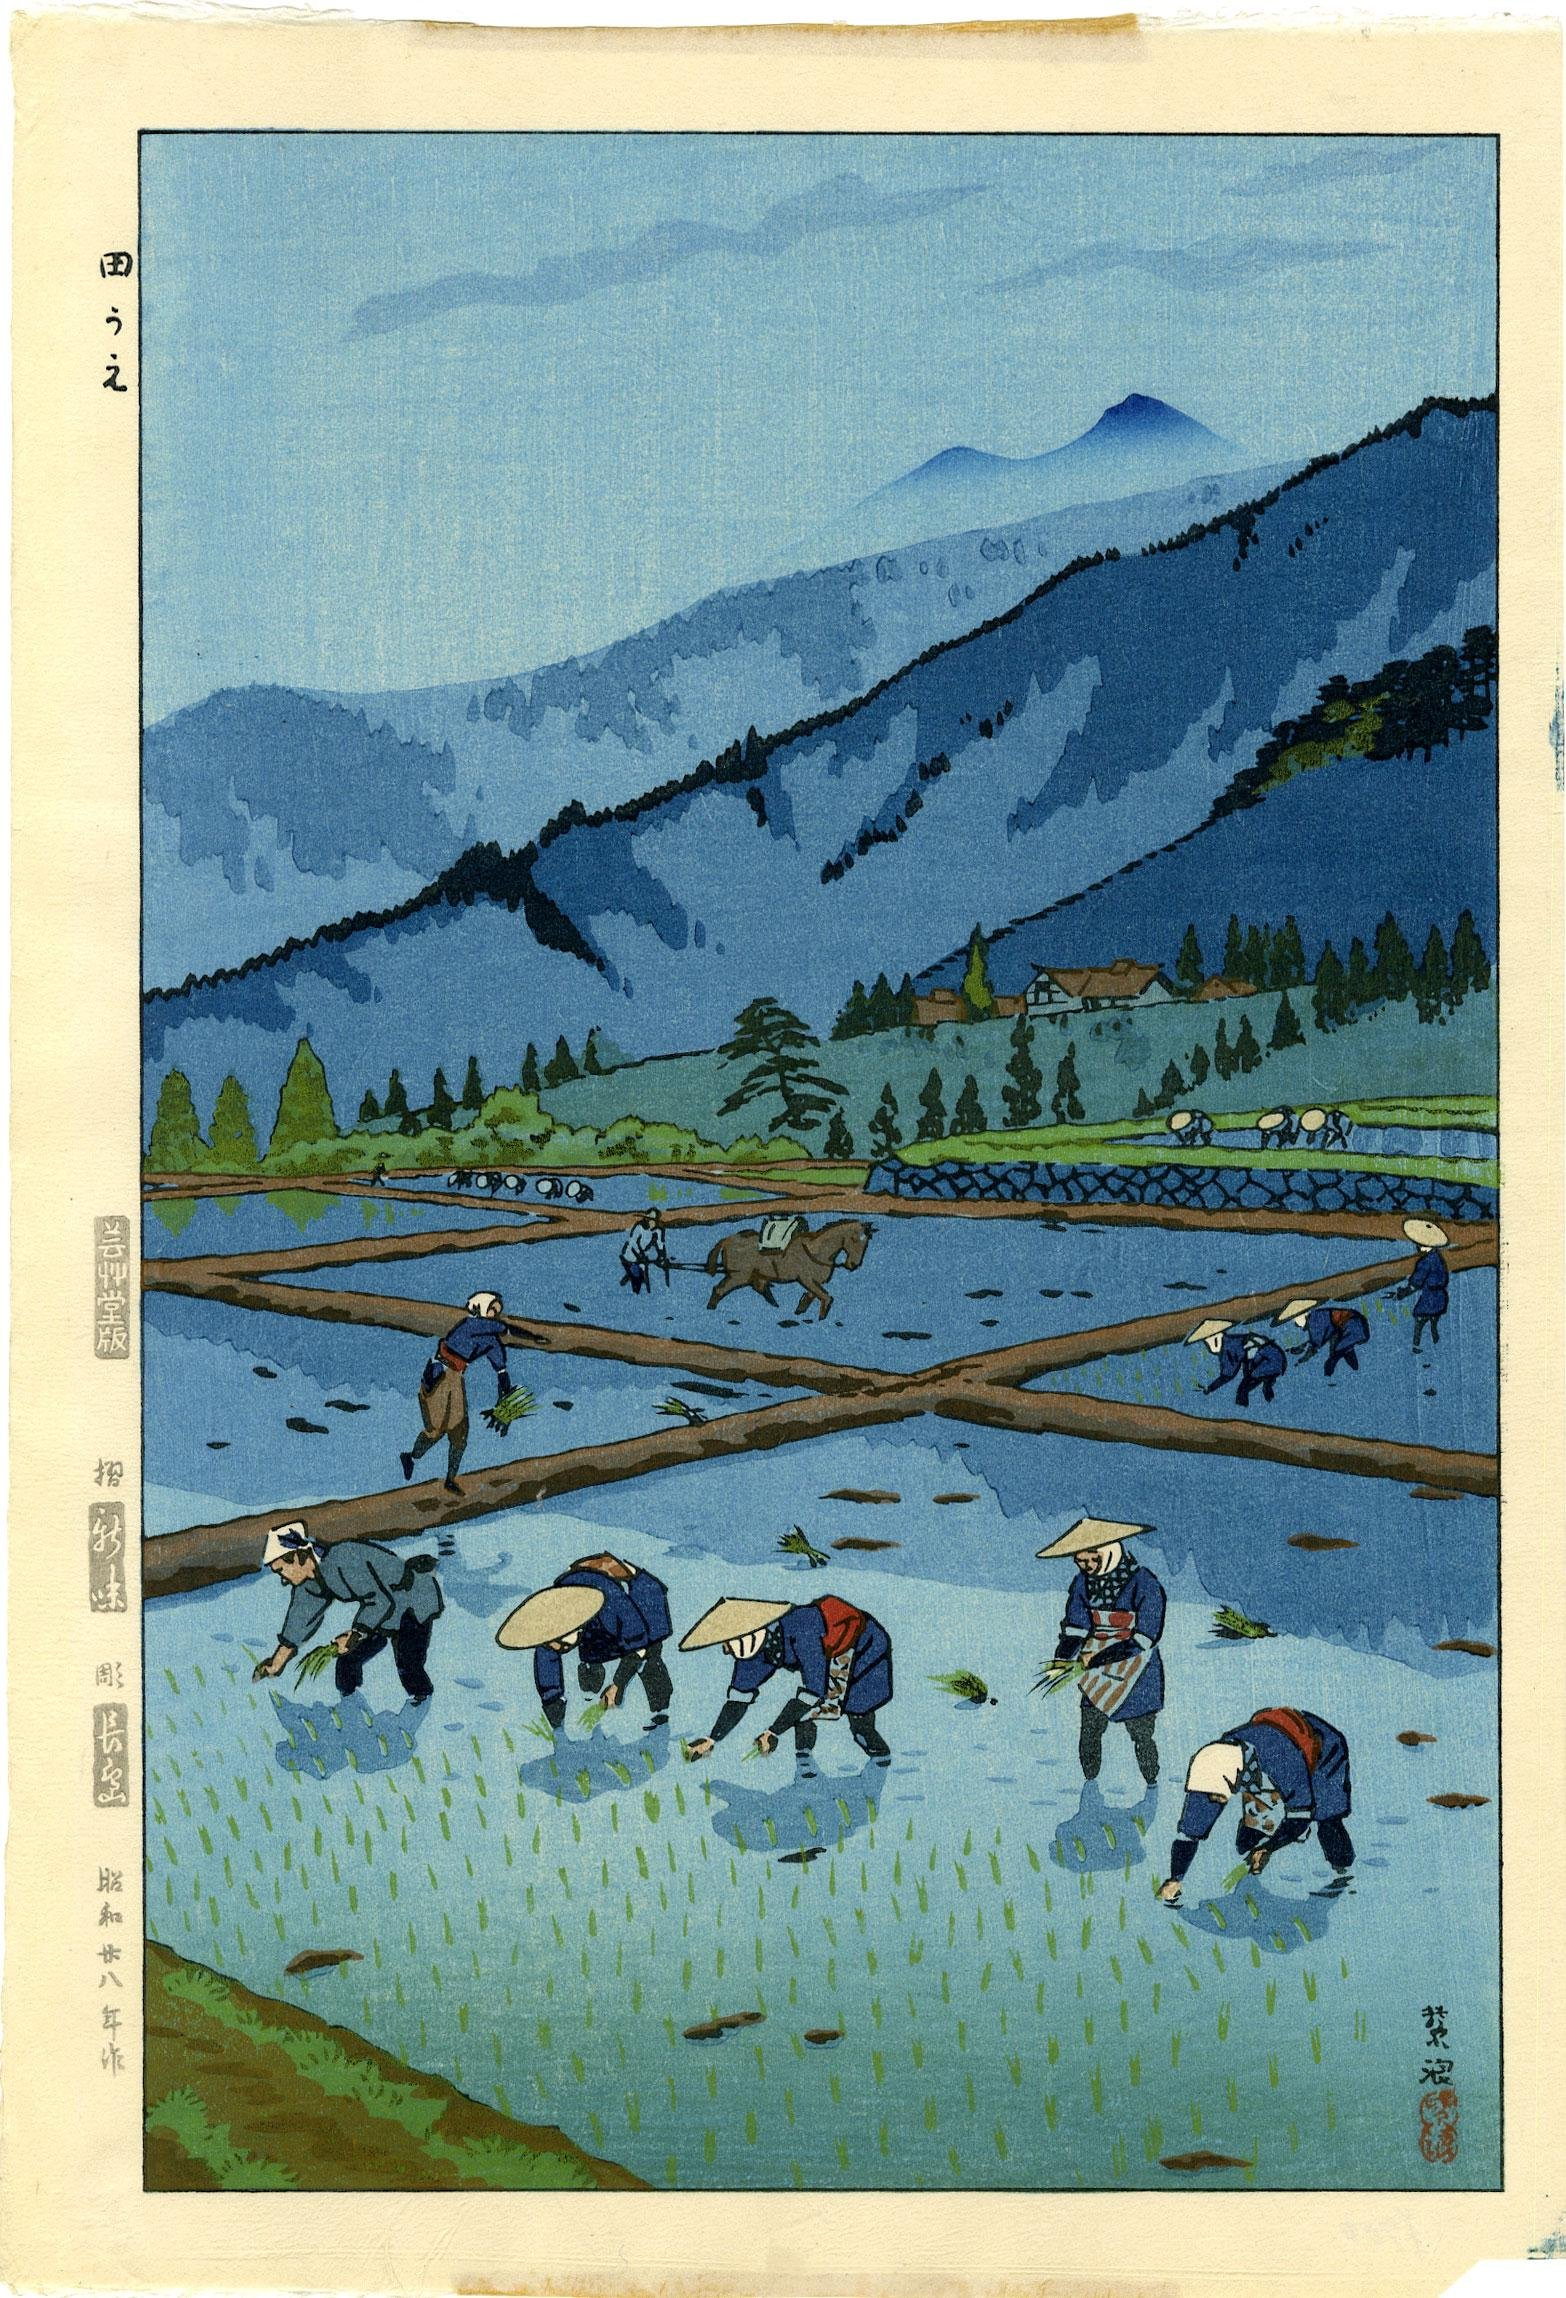 Kasamatsu Shiro: Rice Planting 1953 1st Ed. Woodblock